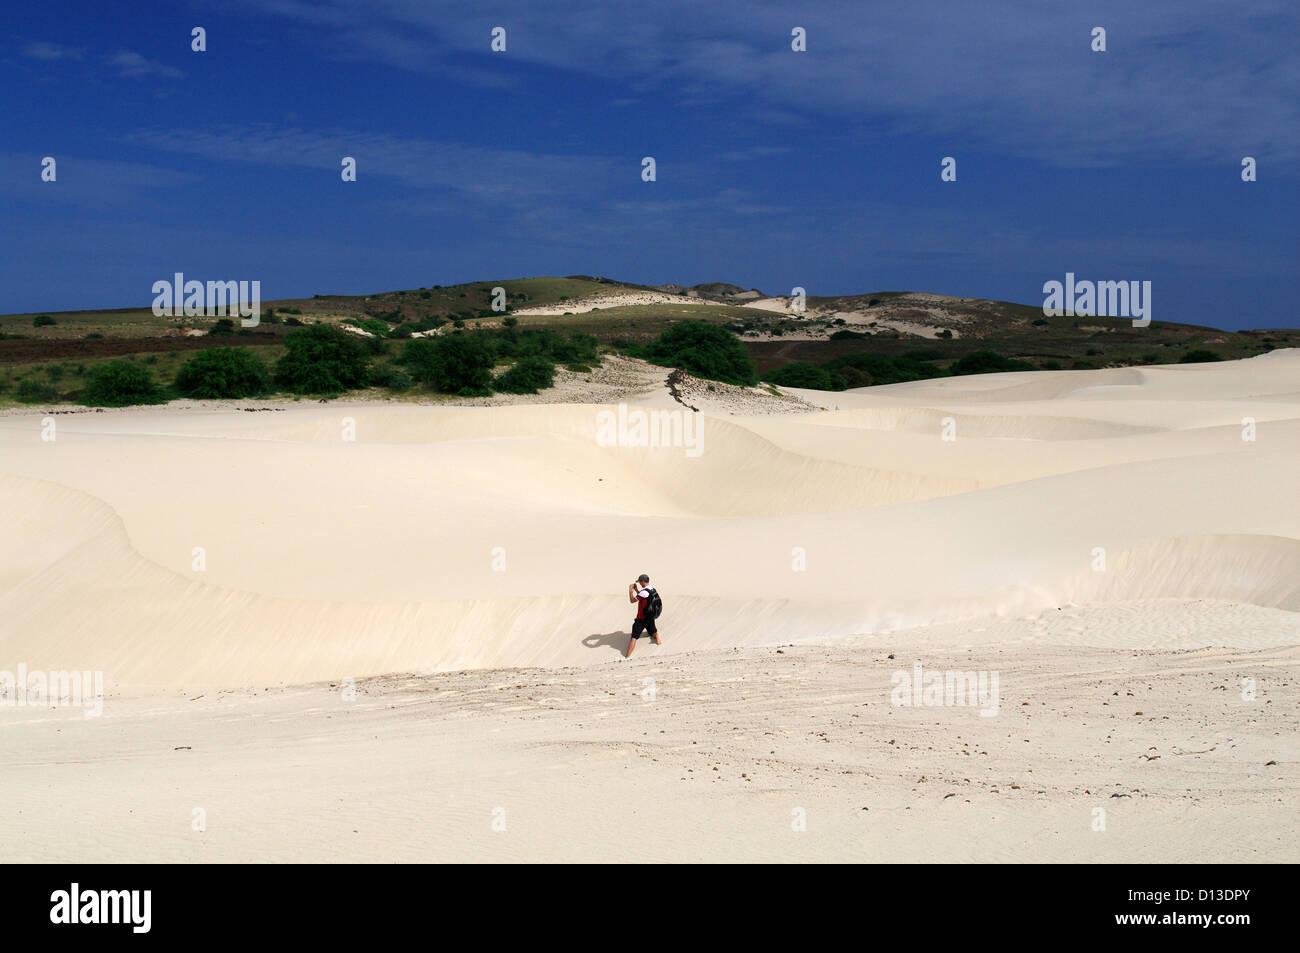 Deserto de Viana - Viana Desert on the island Boa Vista, Cape Verde - Stock Image